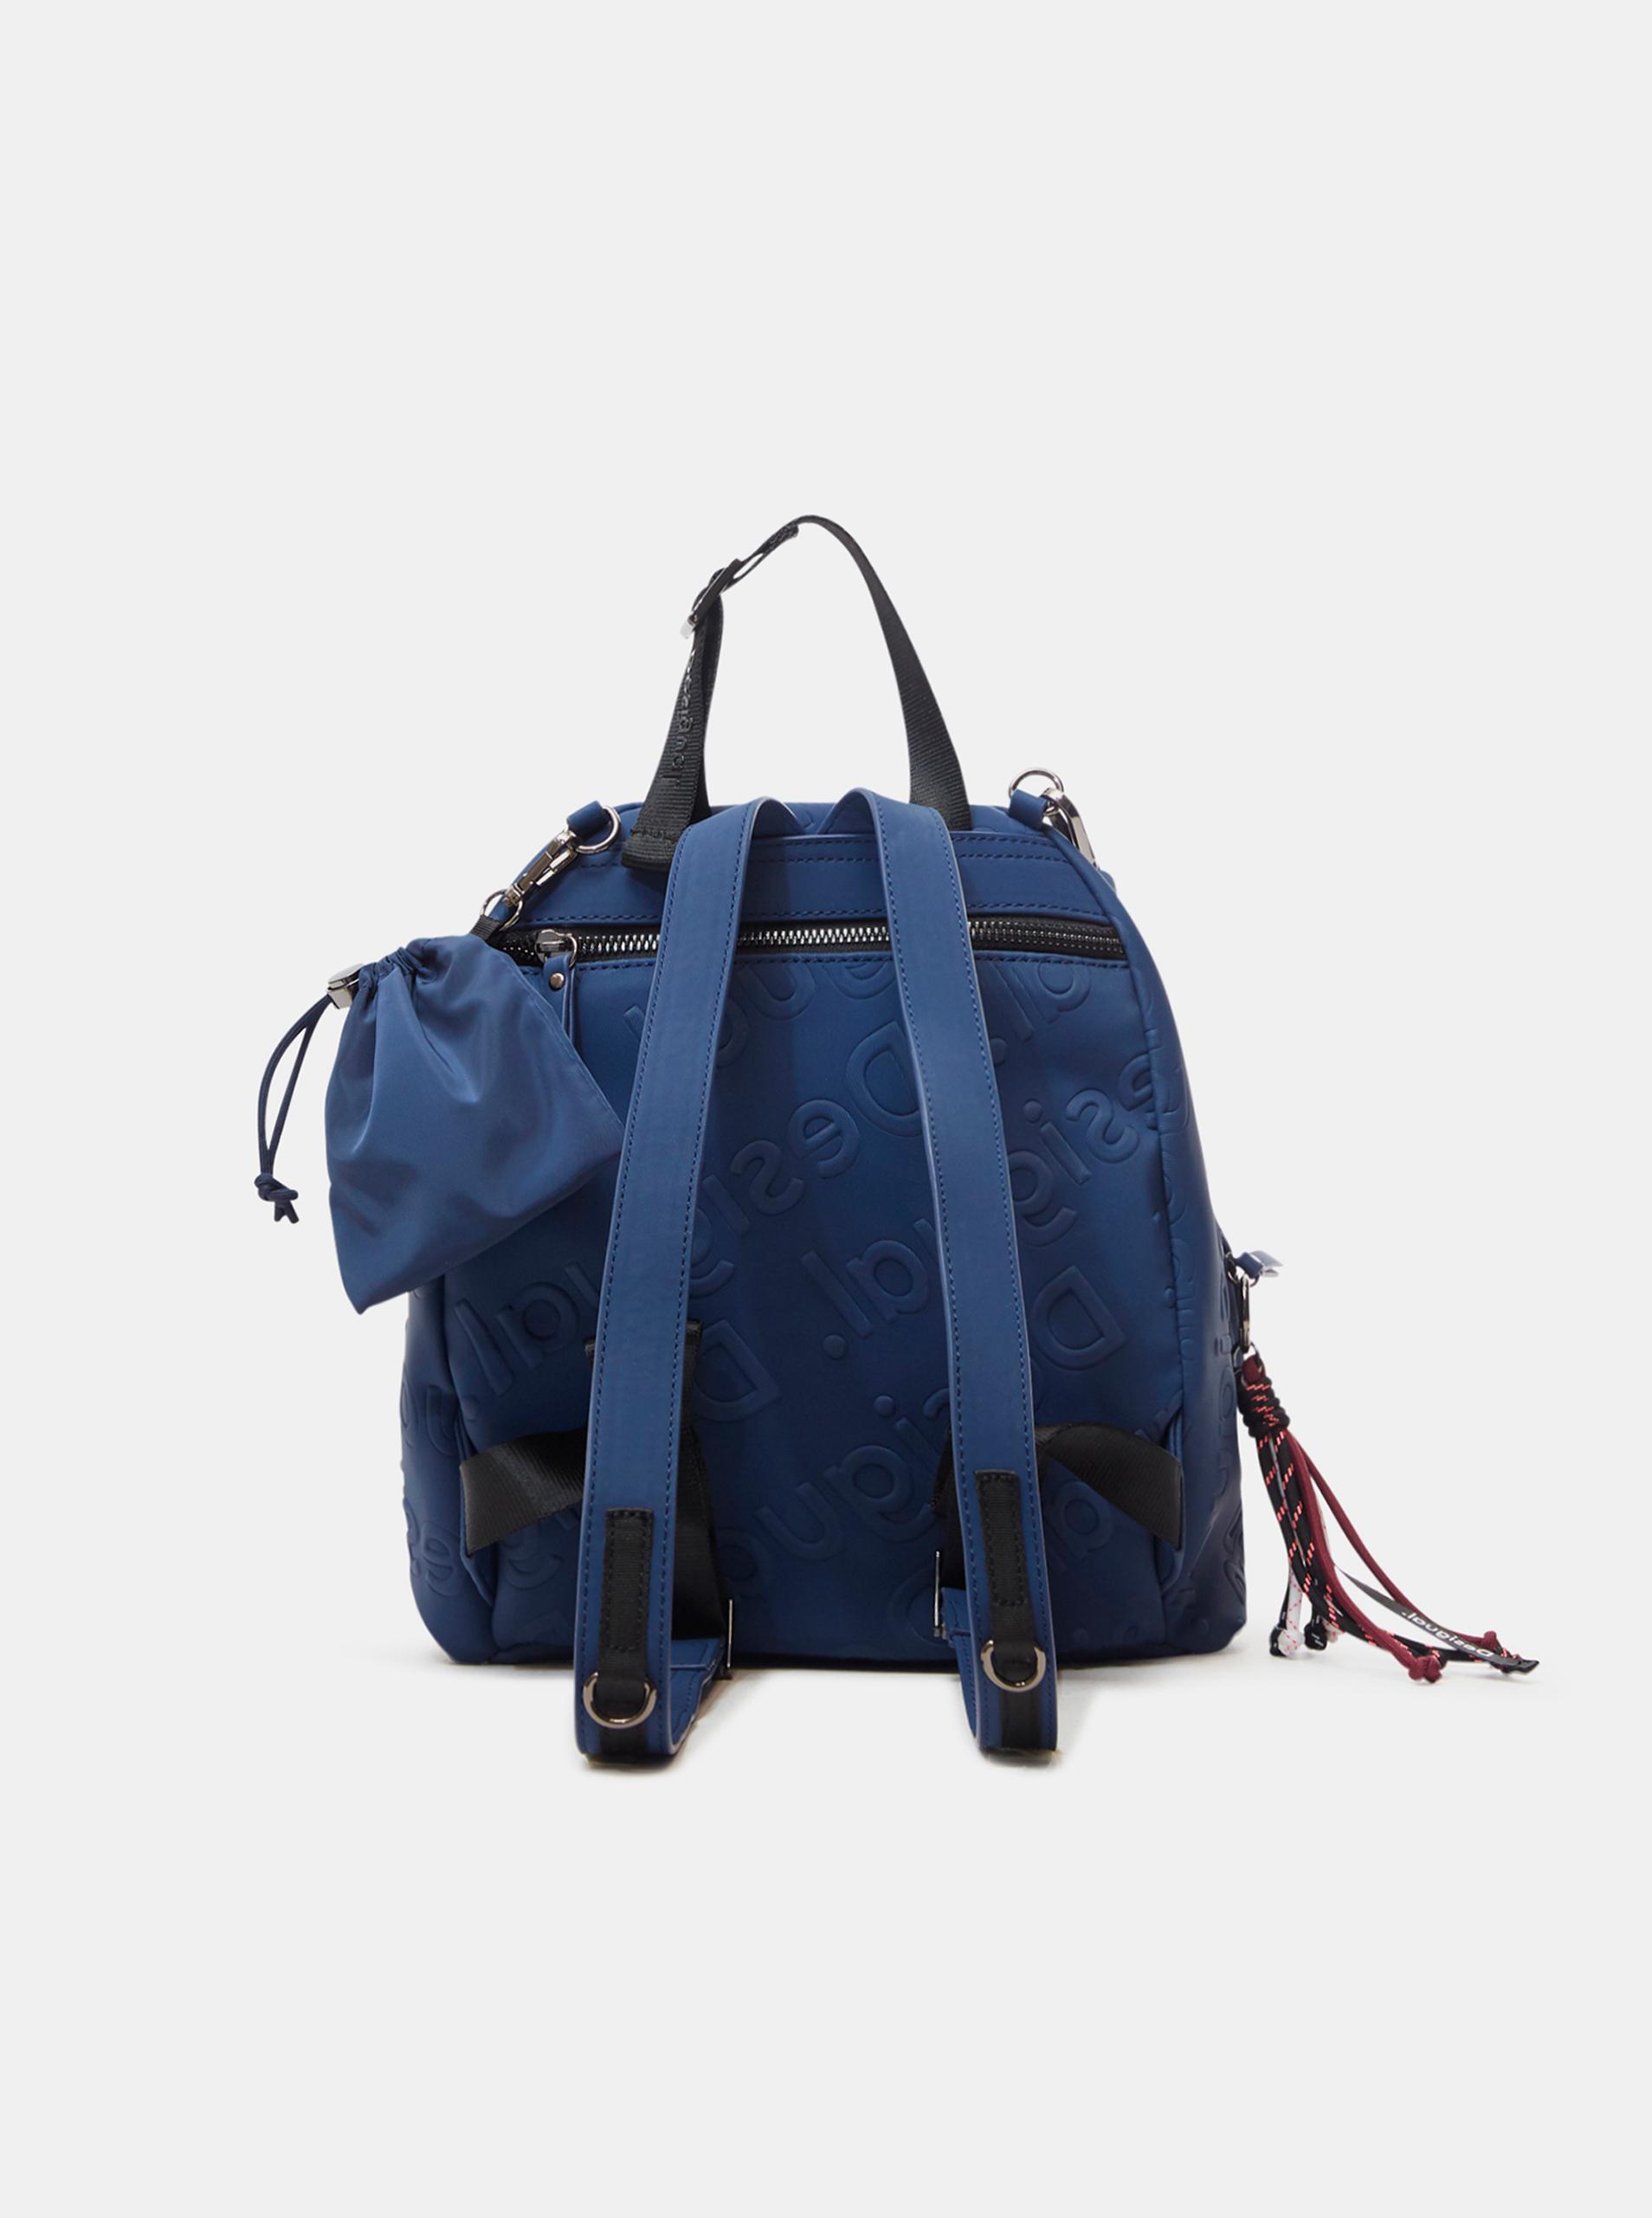 Desigual Plecak damski niebieski  Galia